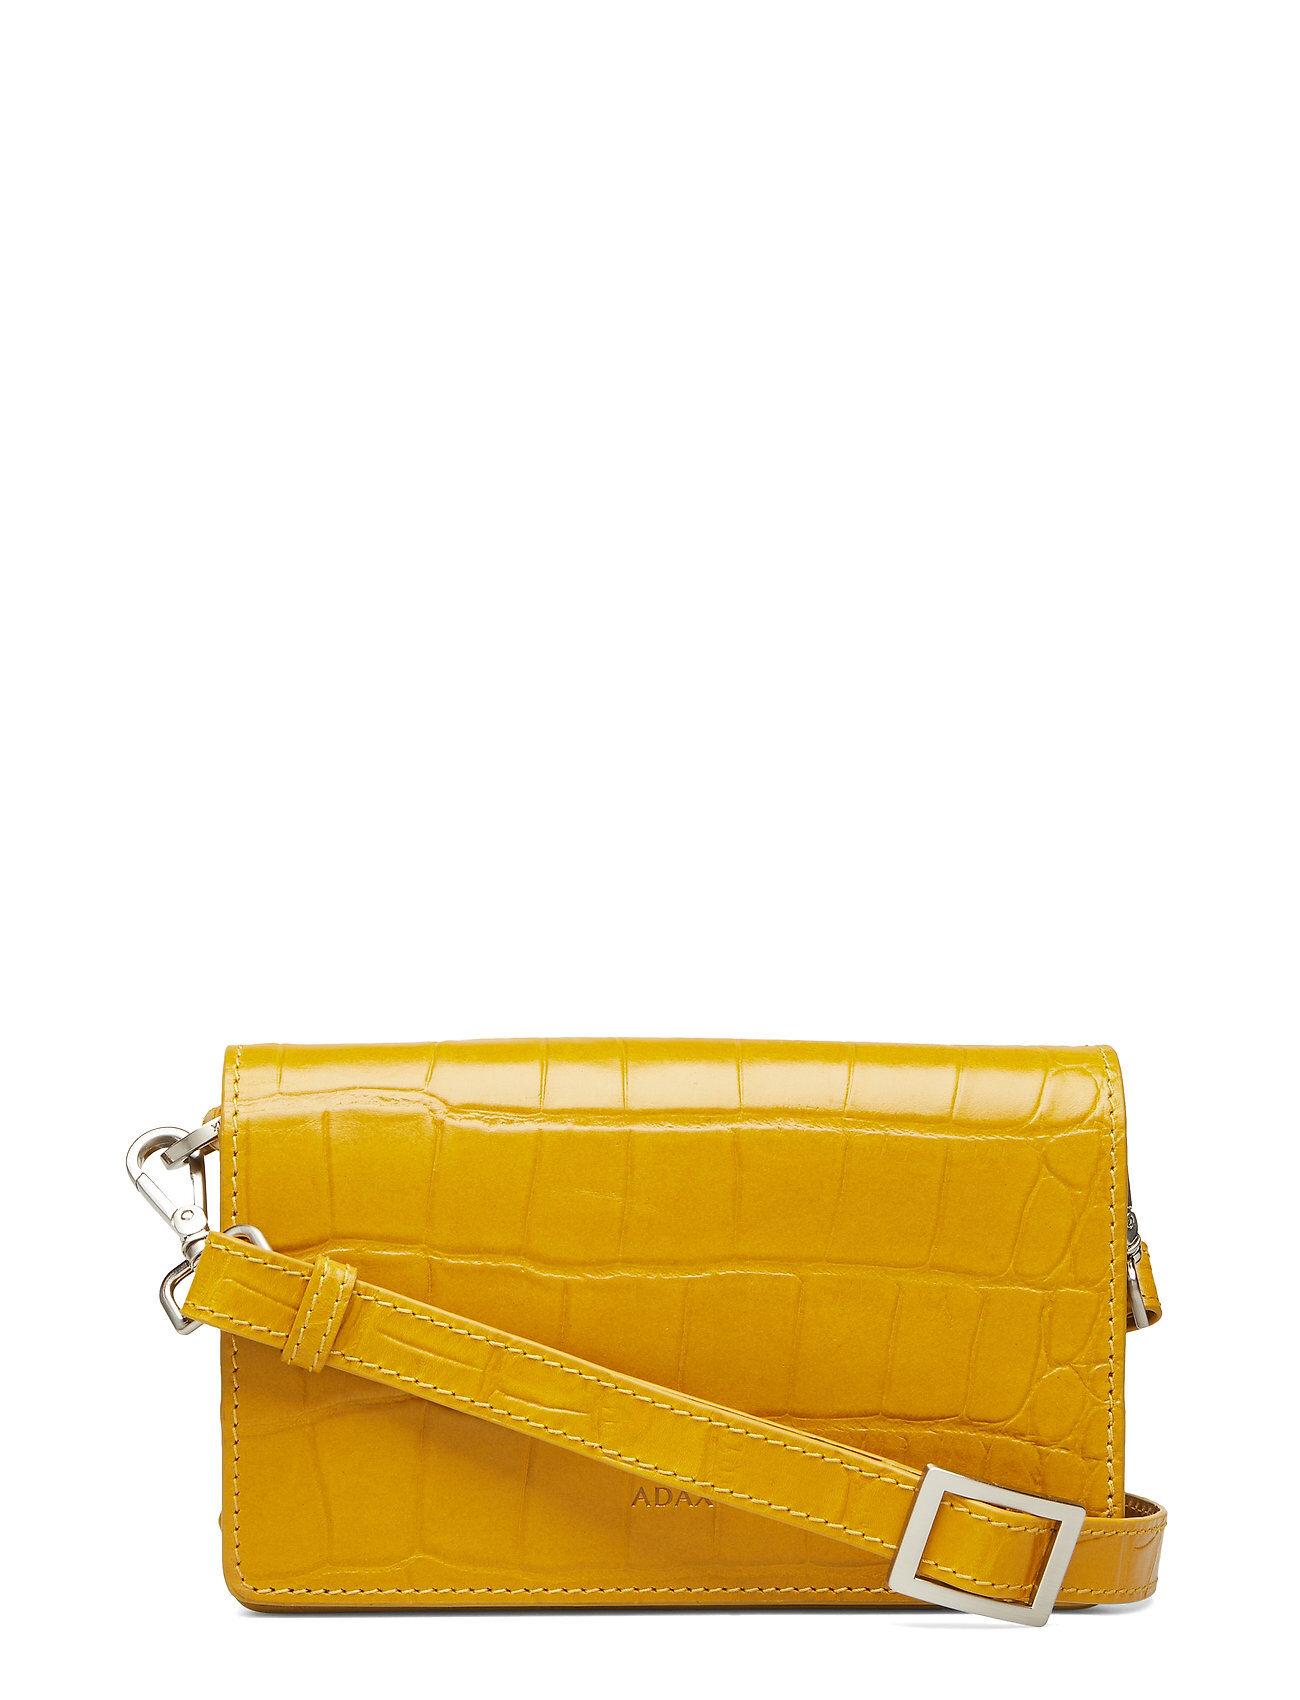 Adax Teramo Shoulder Bag Lykke Bags Small Shoulder Bags - Crossbody Bags Keltainen Adax